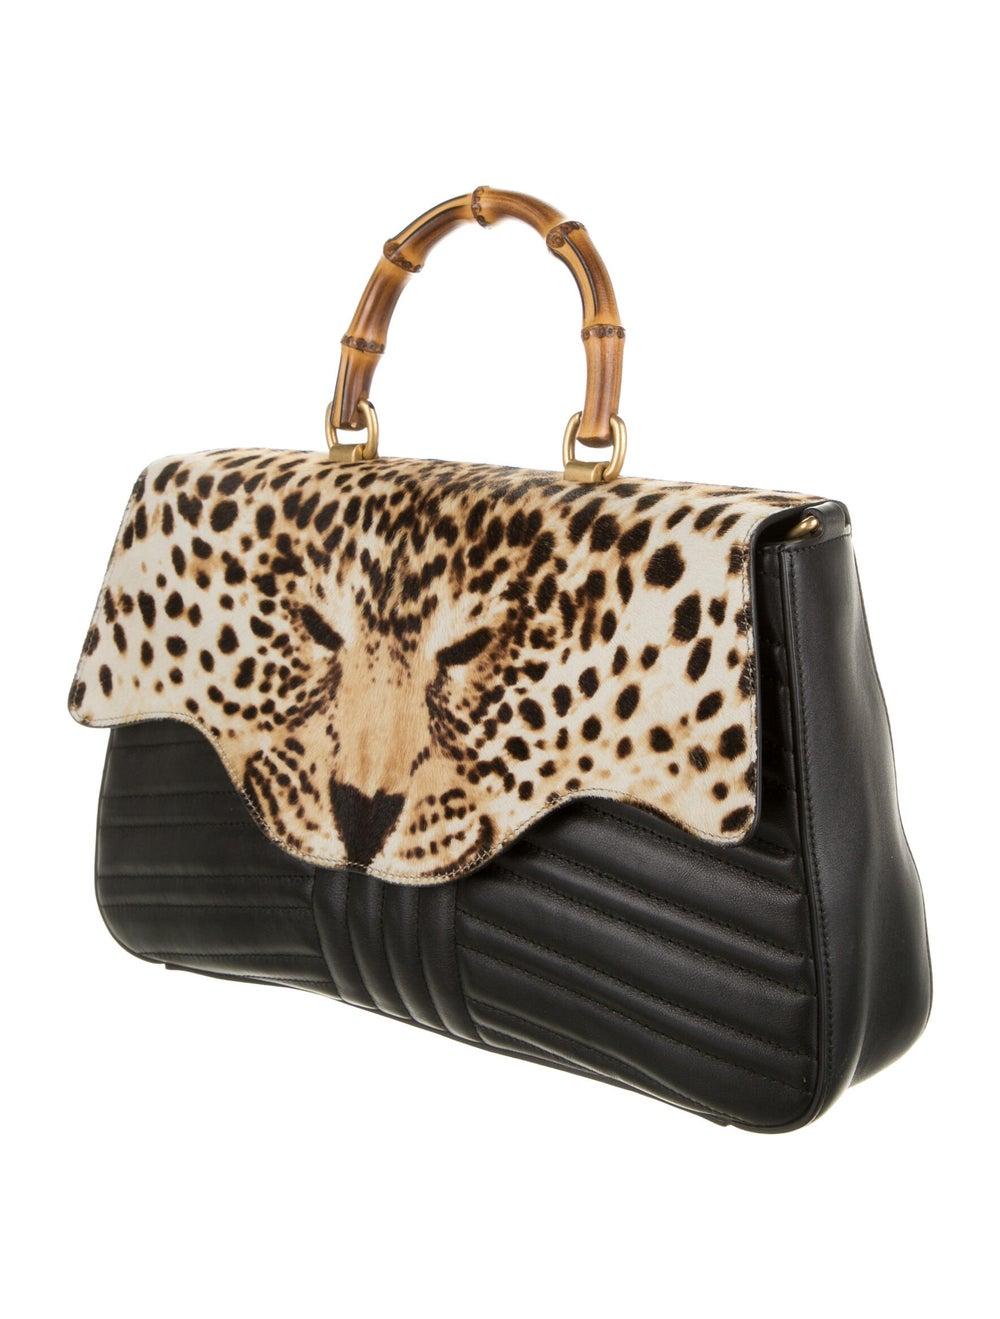 Gucci Bamboo Leopard Top Handle Bag Black - image 3